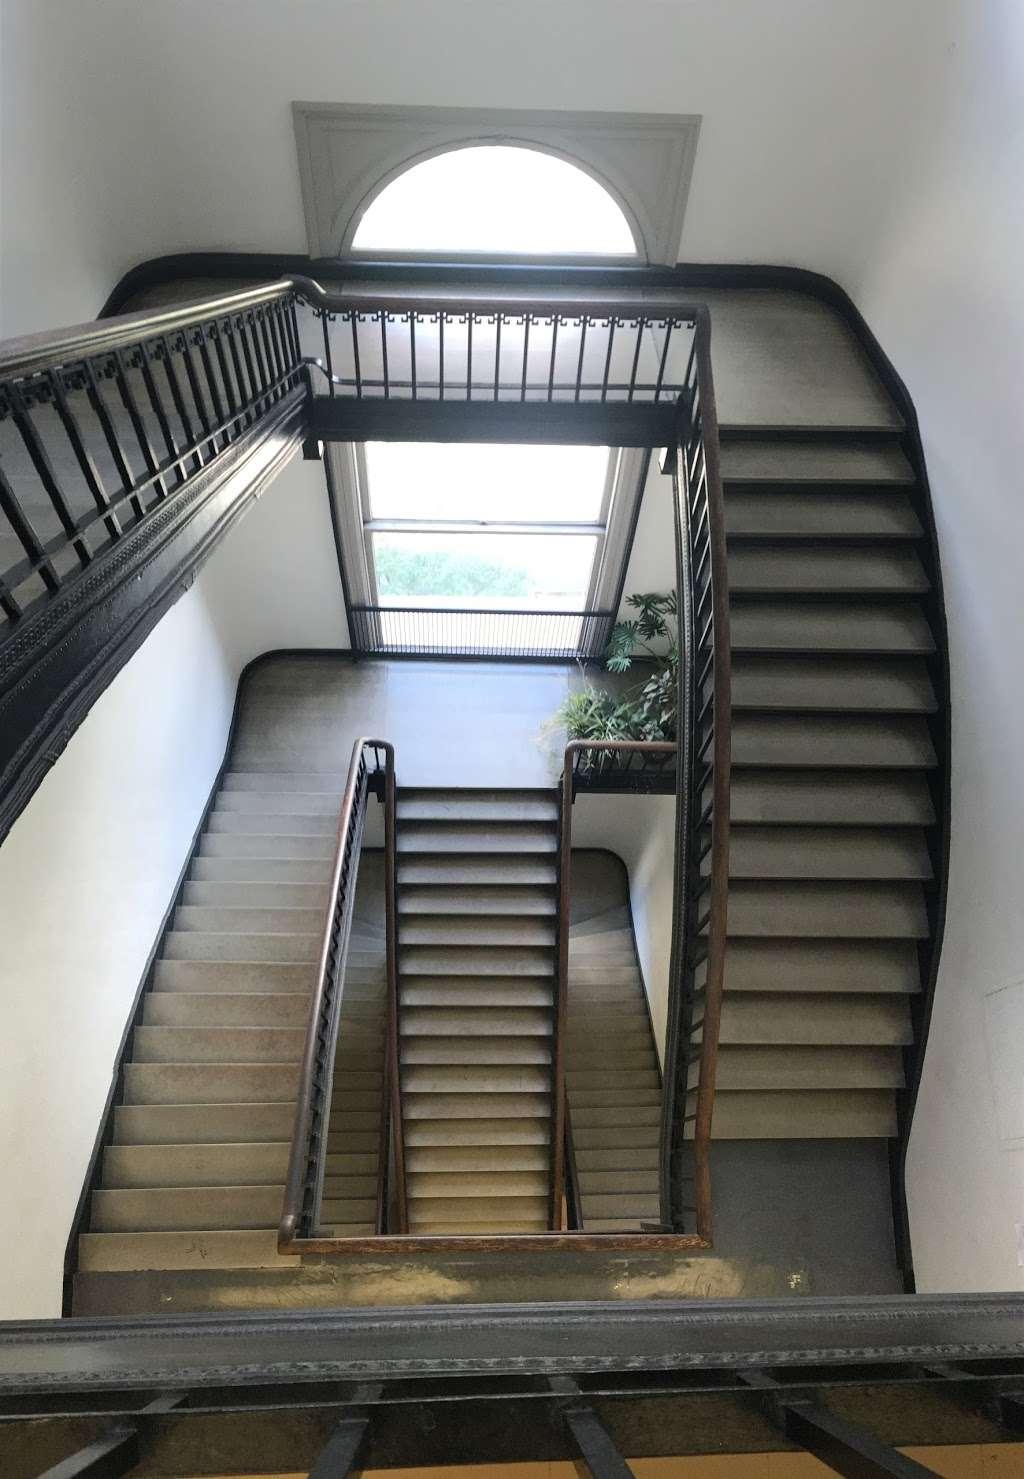 Lewisohn Hall - university  | Photo 2 of 4 | Address: USA, Columbia University, 2970 Broadway, New York, NY 10027, USA